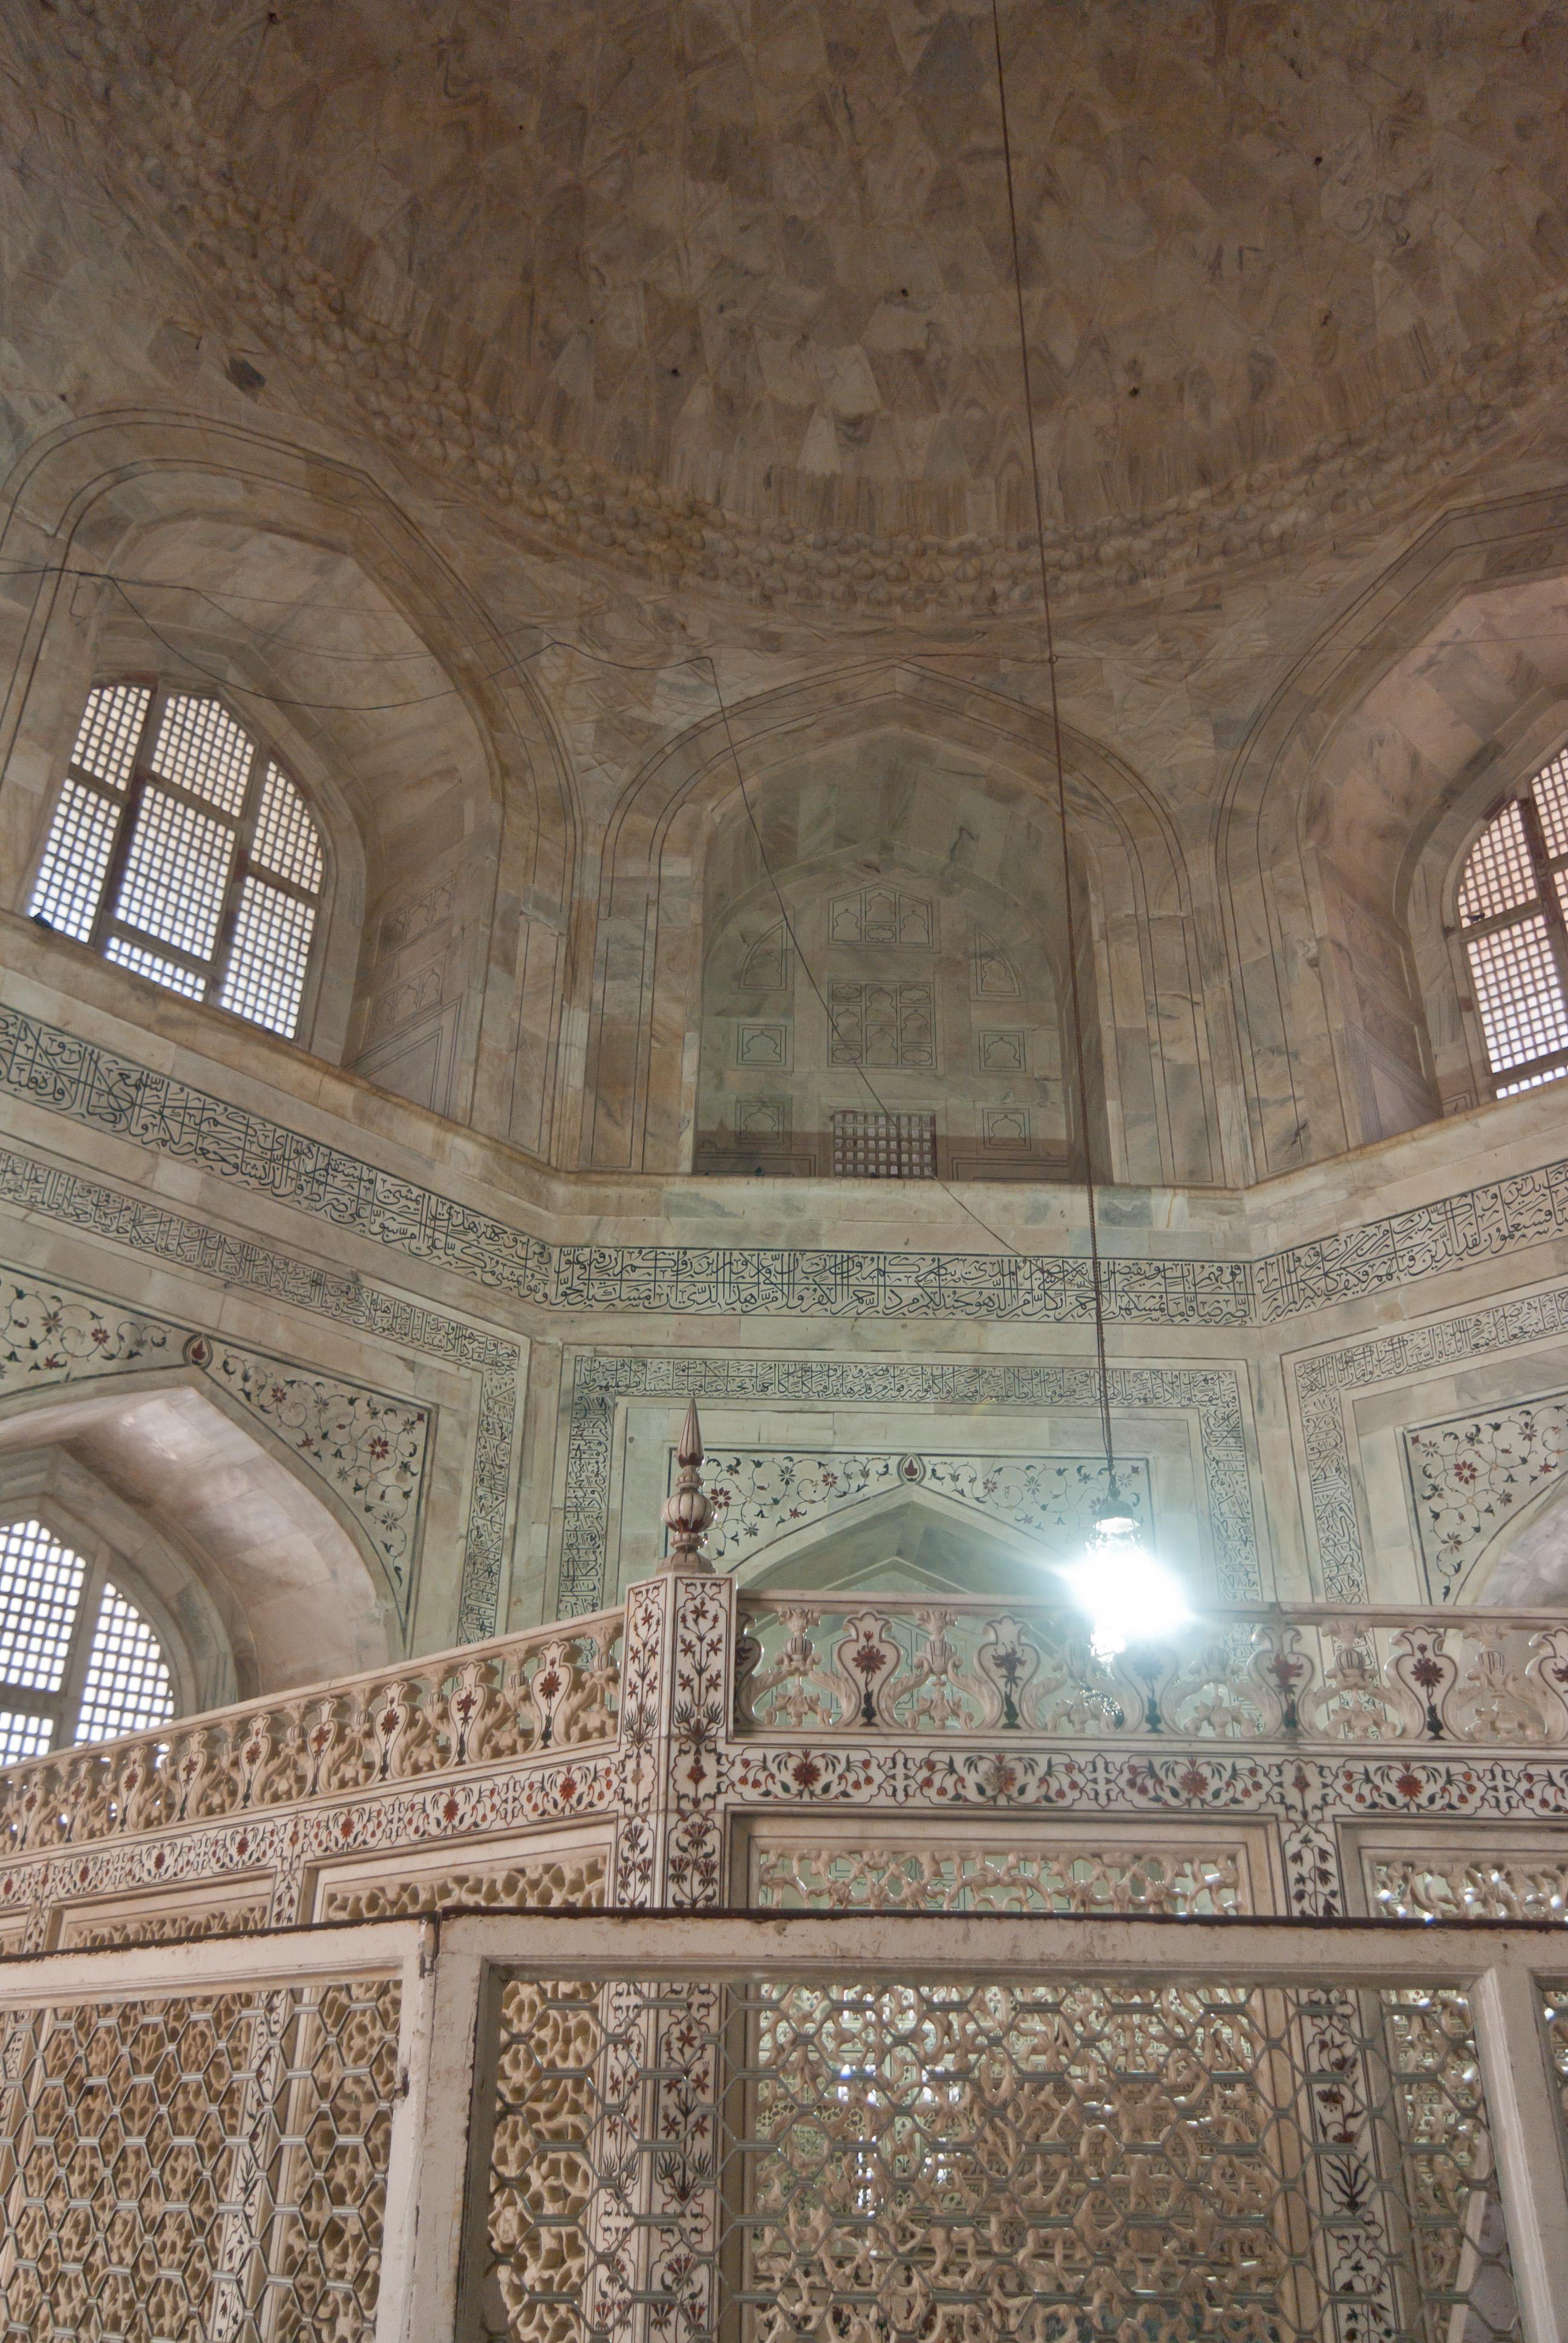 Interior of the Taj Mahal, Agra, India